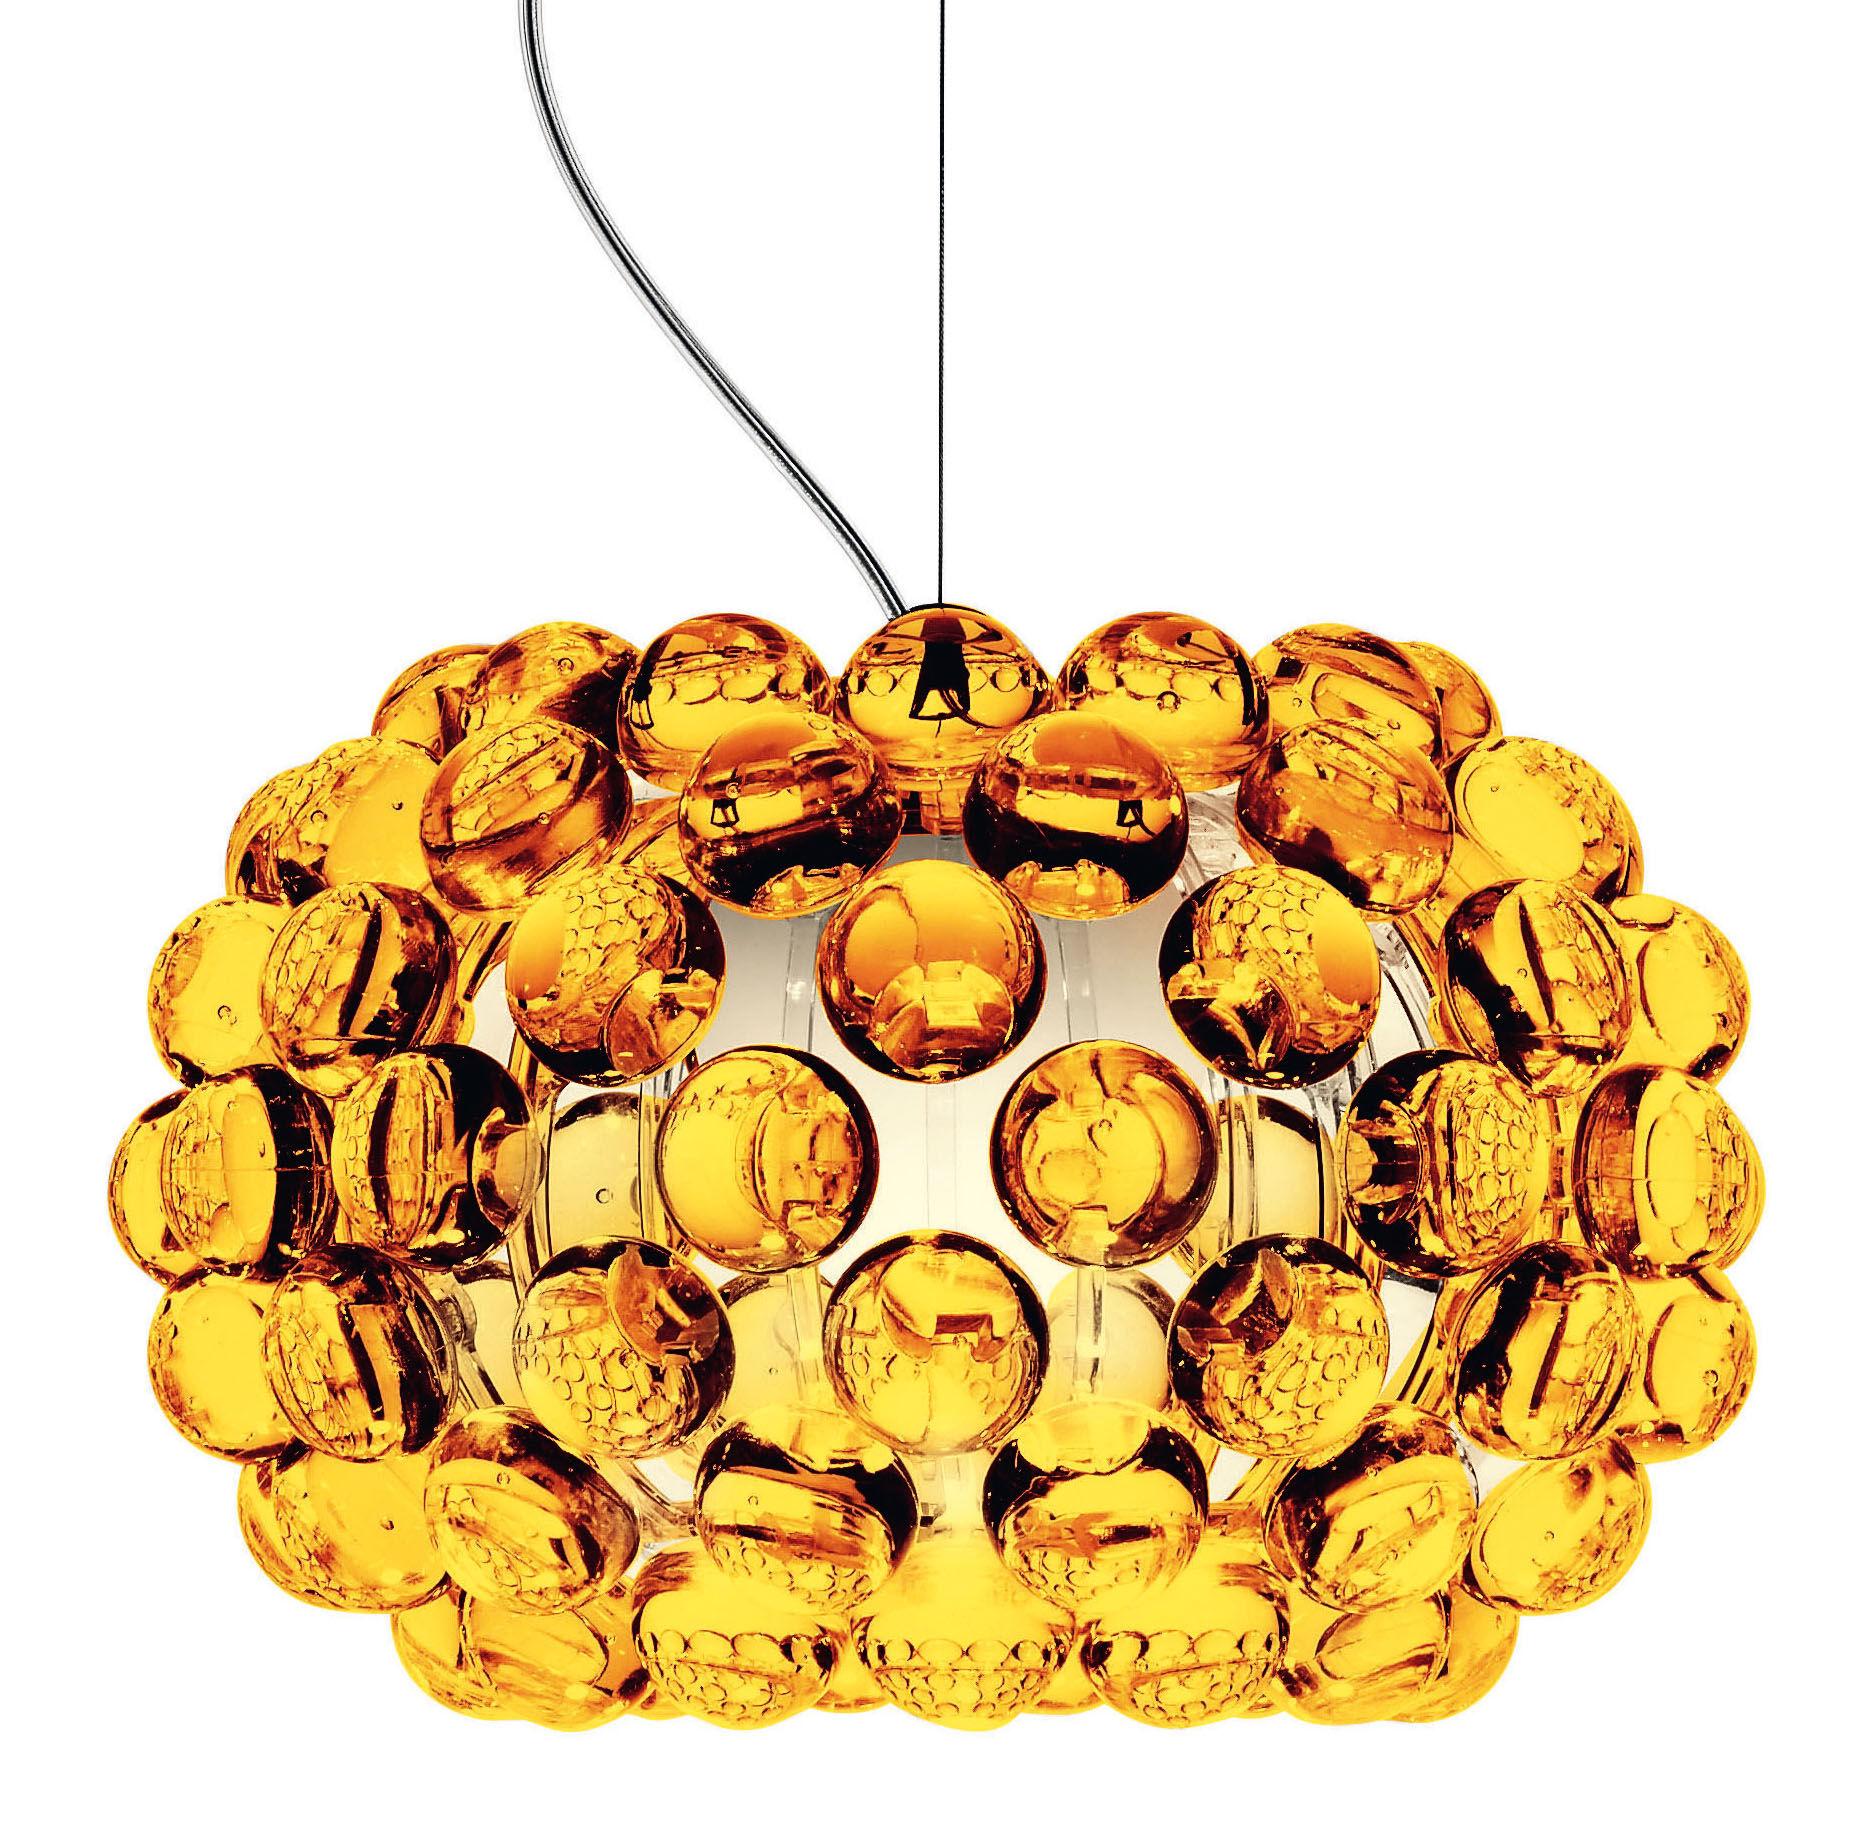 Lighting - Pendant Lighting - Caboche Piccola Pendant - Piccola by Foscarini - Amber - Ø 31 cm - PMMA